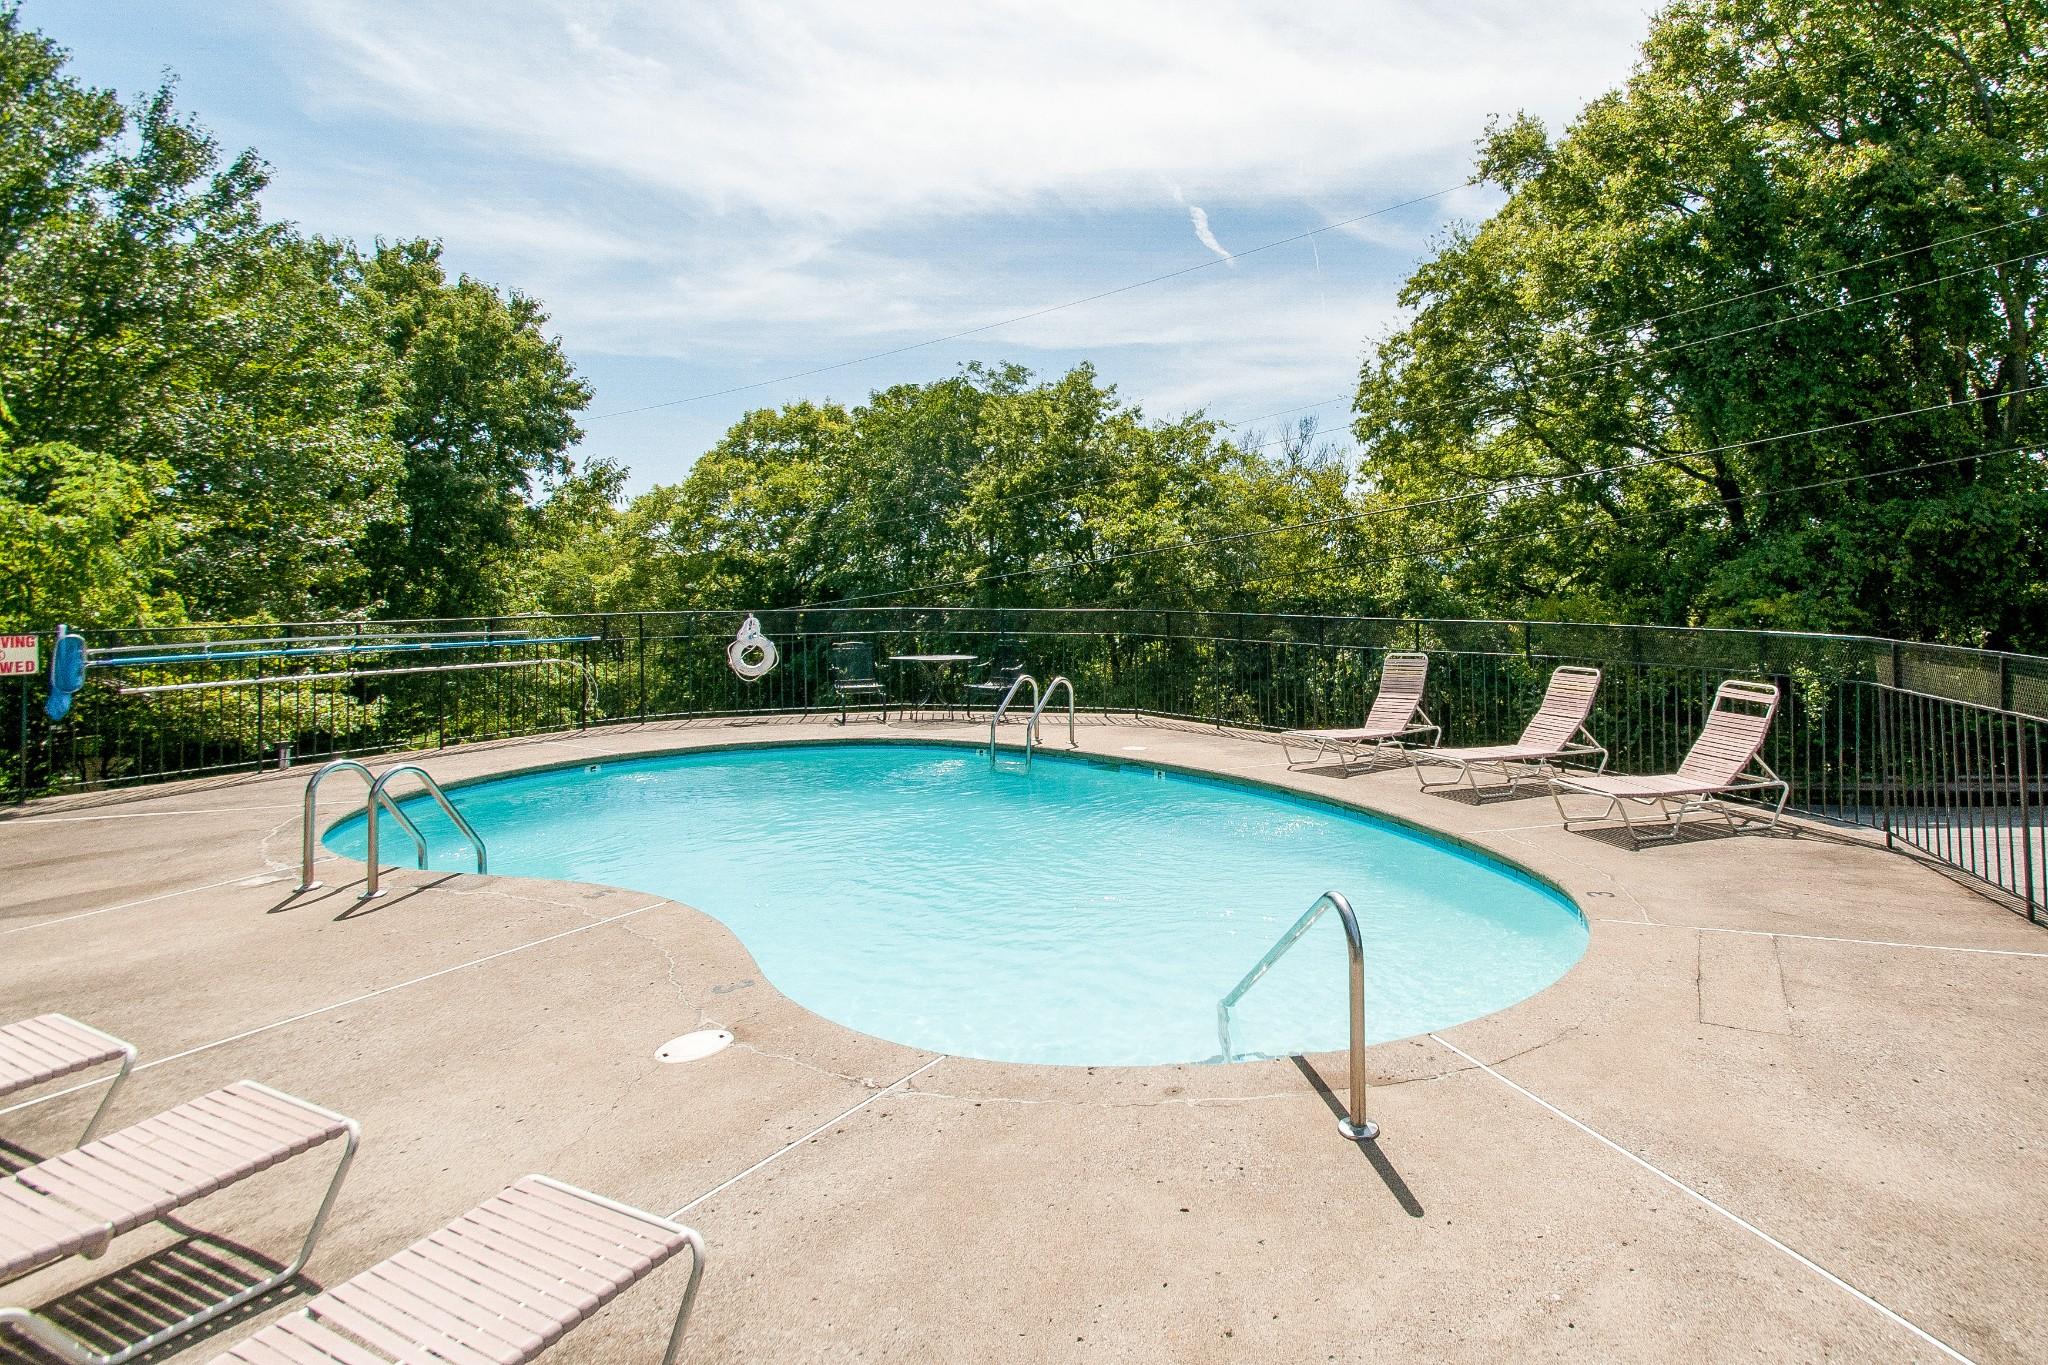 110 Bellevue Rd, Bellevue in Davidson County, TN County, TN 37221 Home for Sale